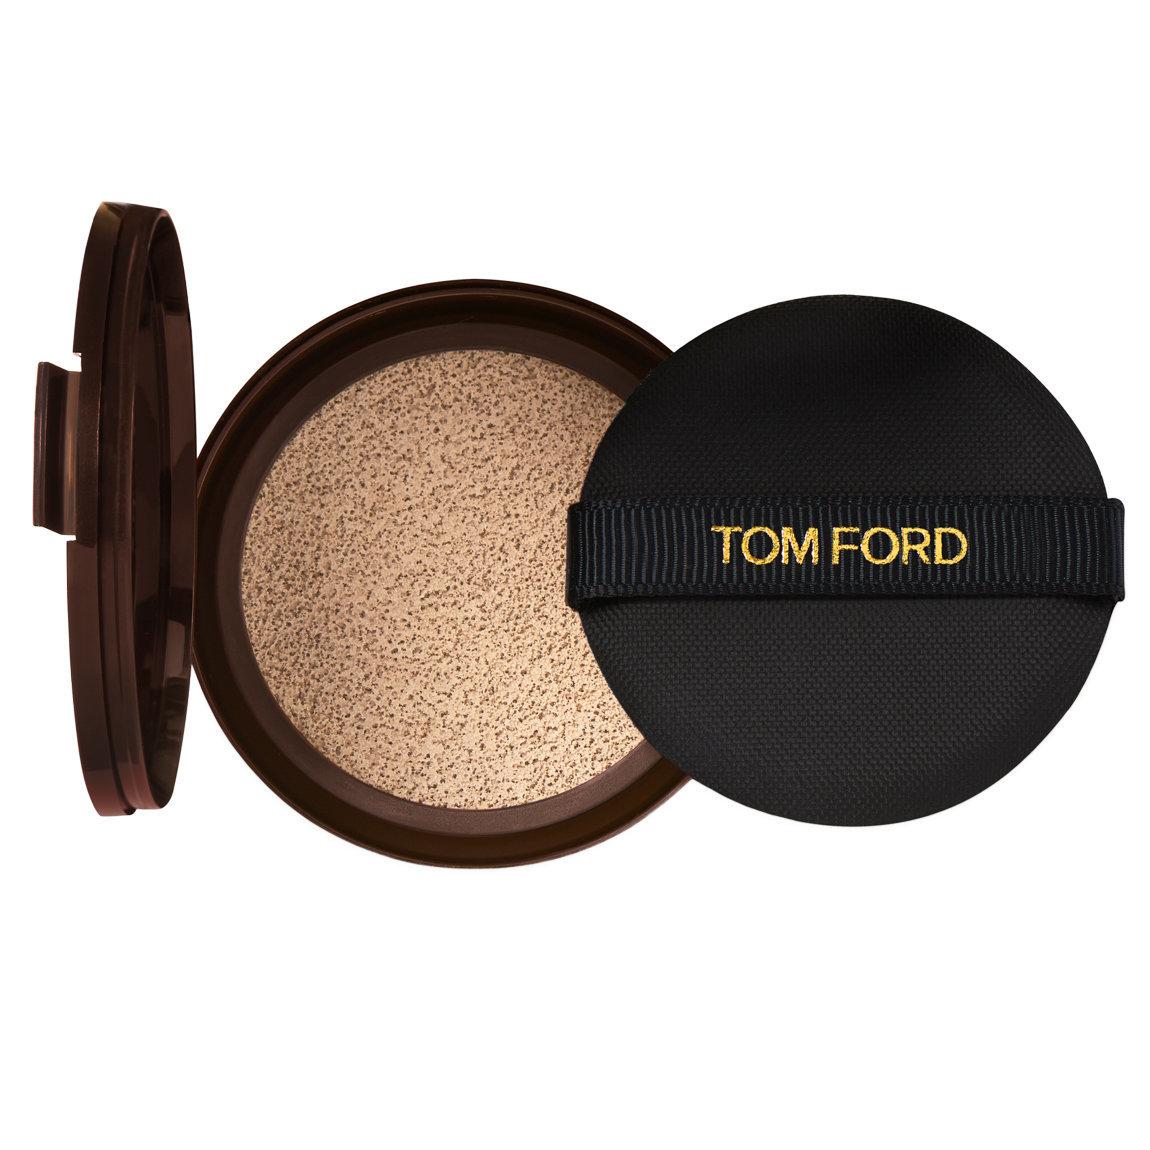 TOM FORD Shade & Illuminate Soft Radiance Foundation Cushion Compact Refill 0.3 Ivory Silk alternative view 1.